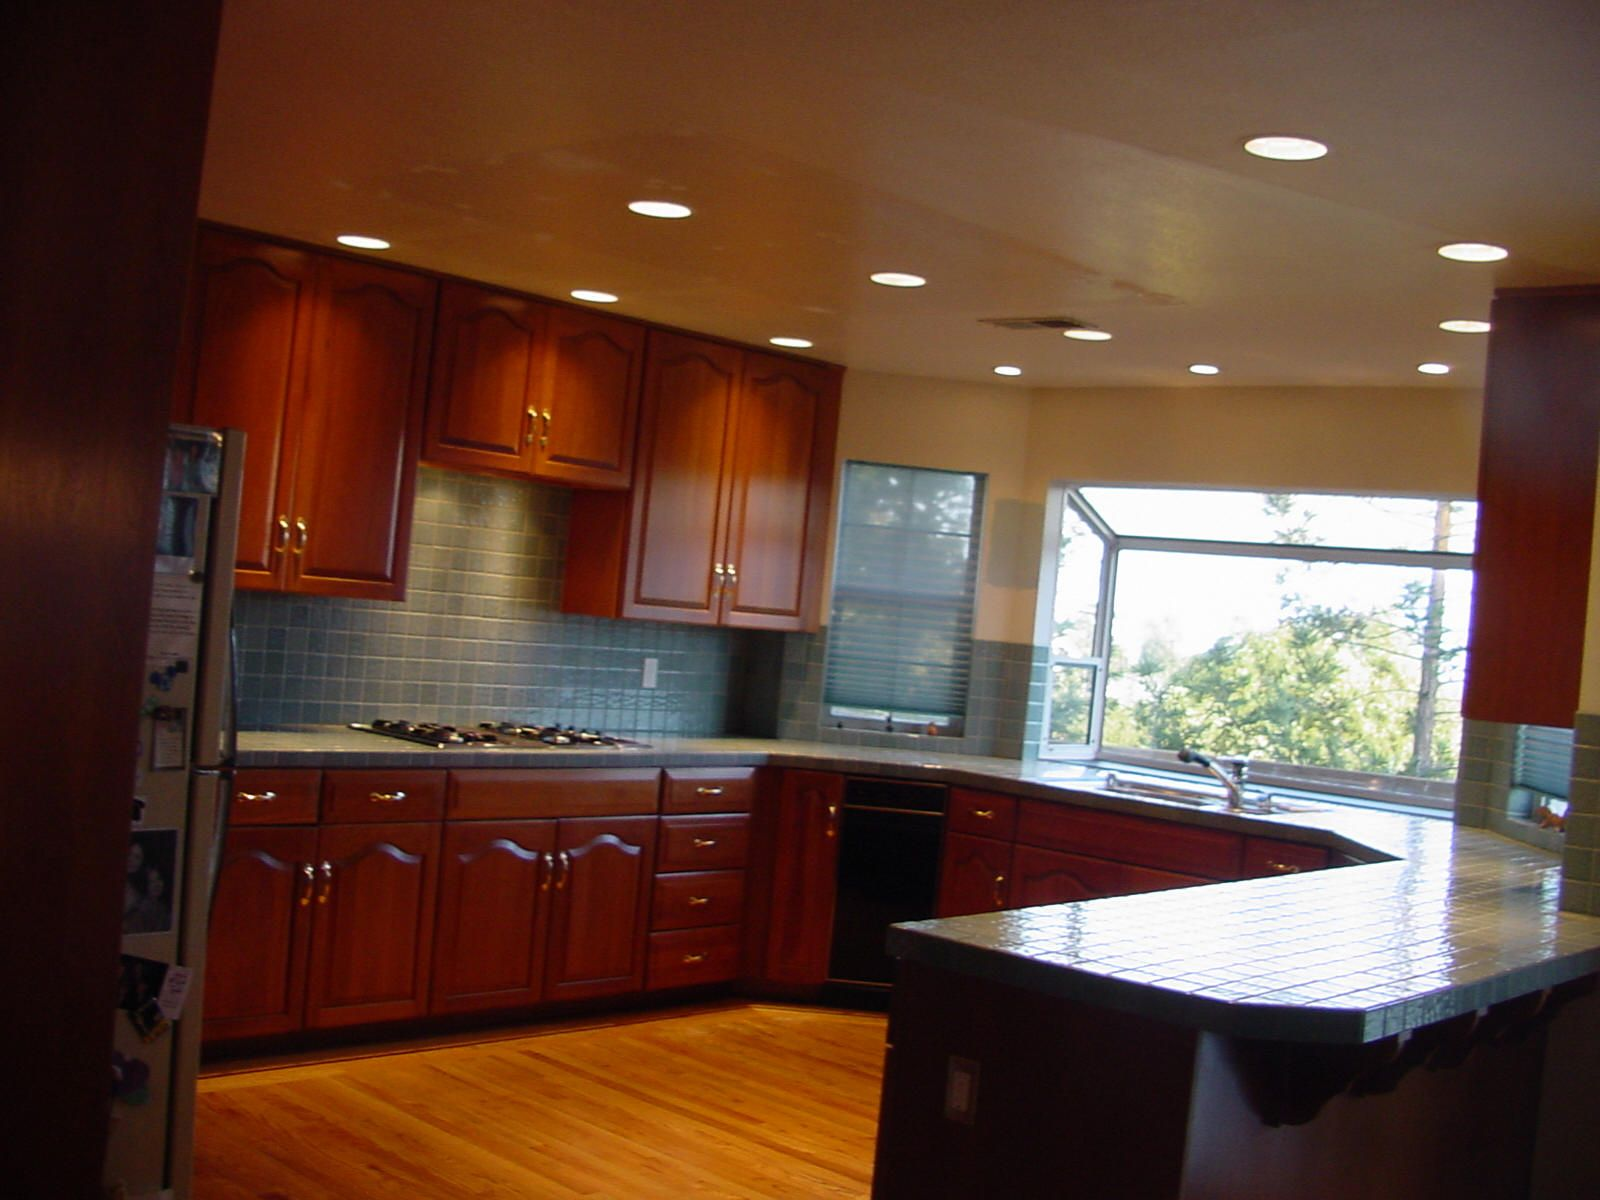 17 Lighting Onrustic Lighting. Ideas For Kitchen Islands In Small Kitchens. Small Kitchens with Islands Designs with Modern 2door Refrigerator. New Small Kitchen Island Ideas for The Homenarrow